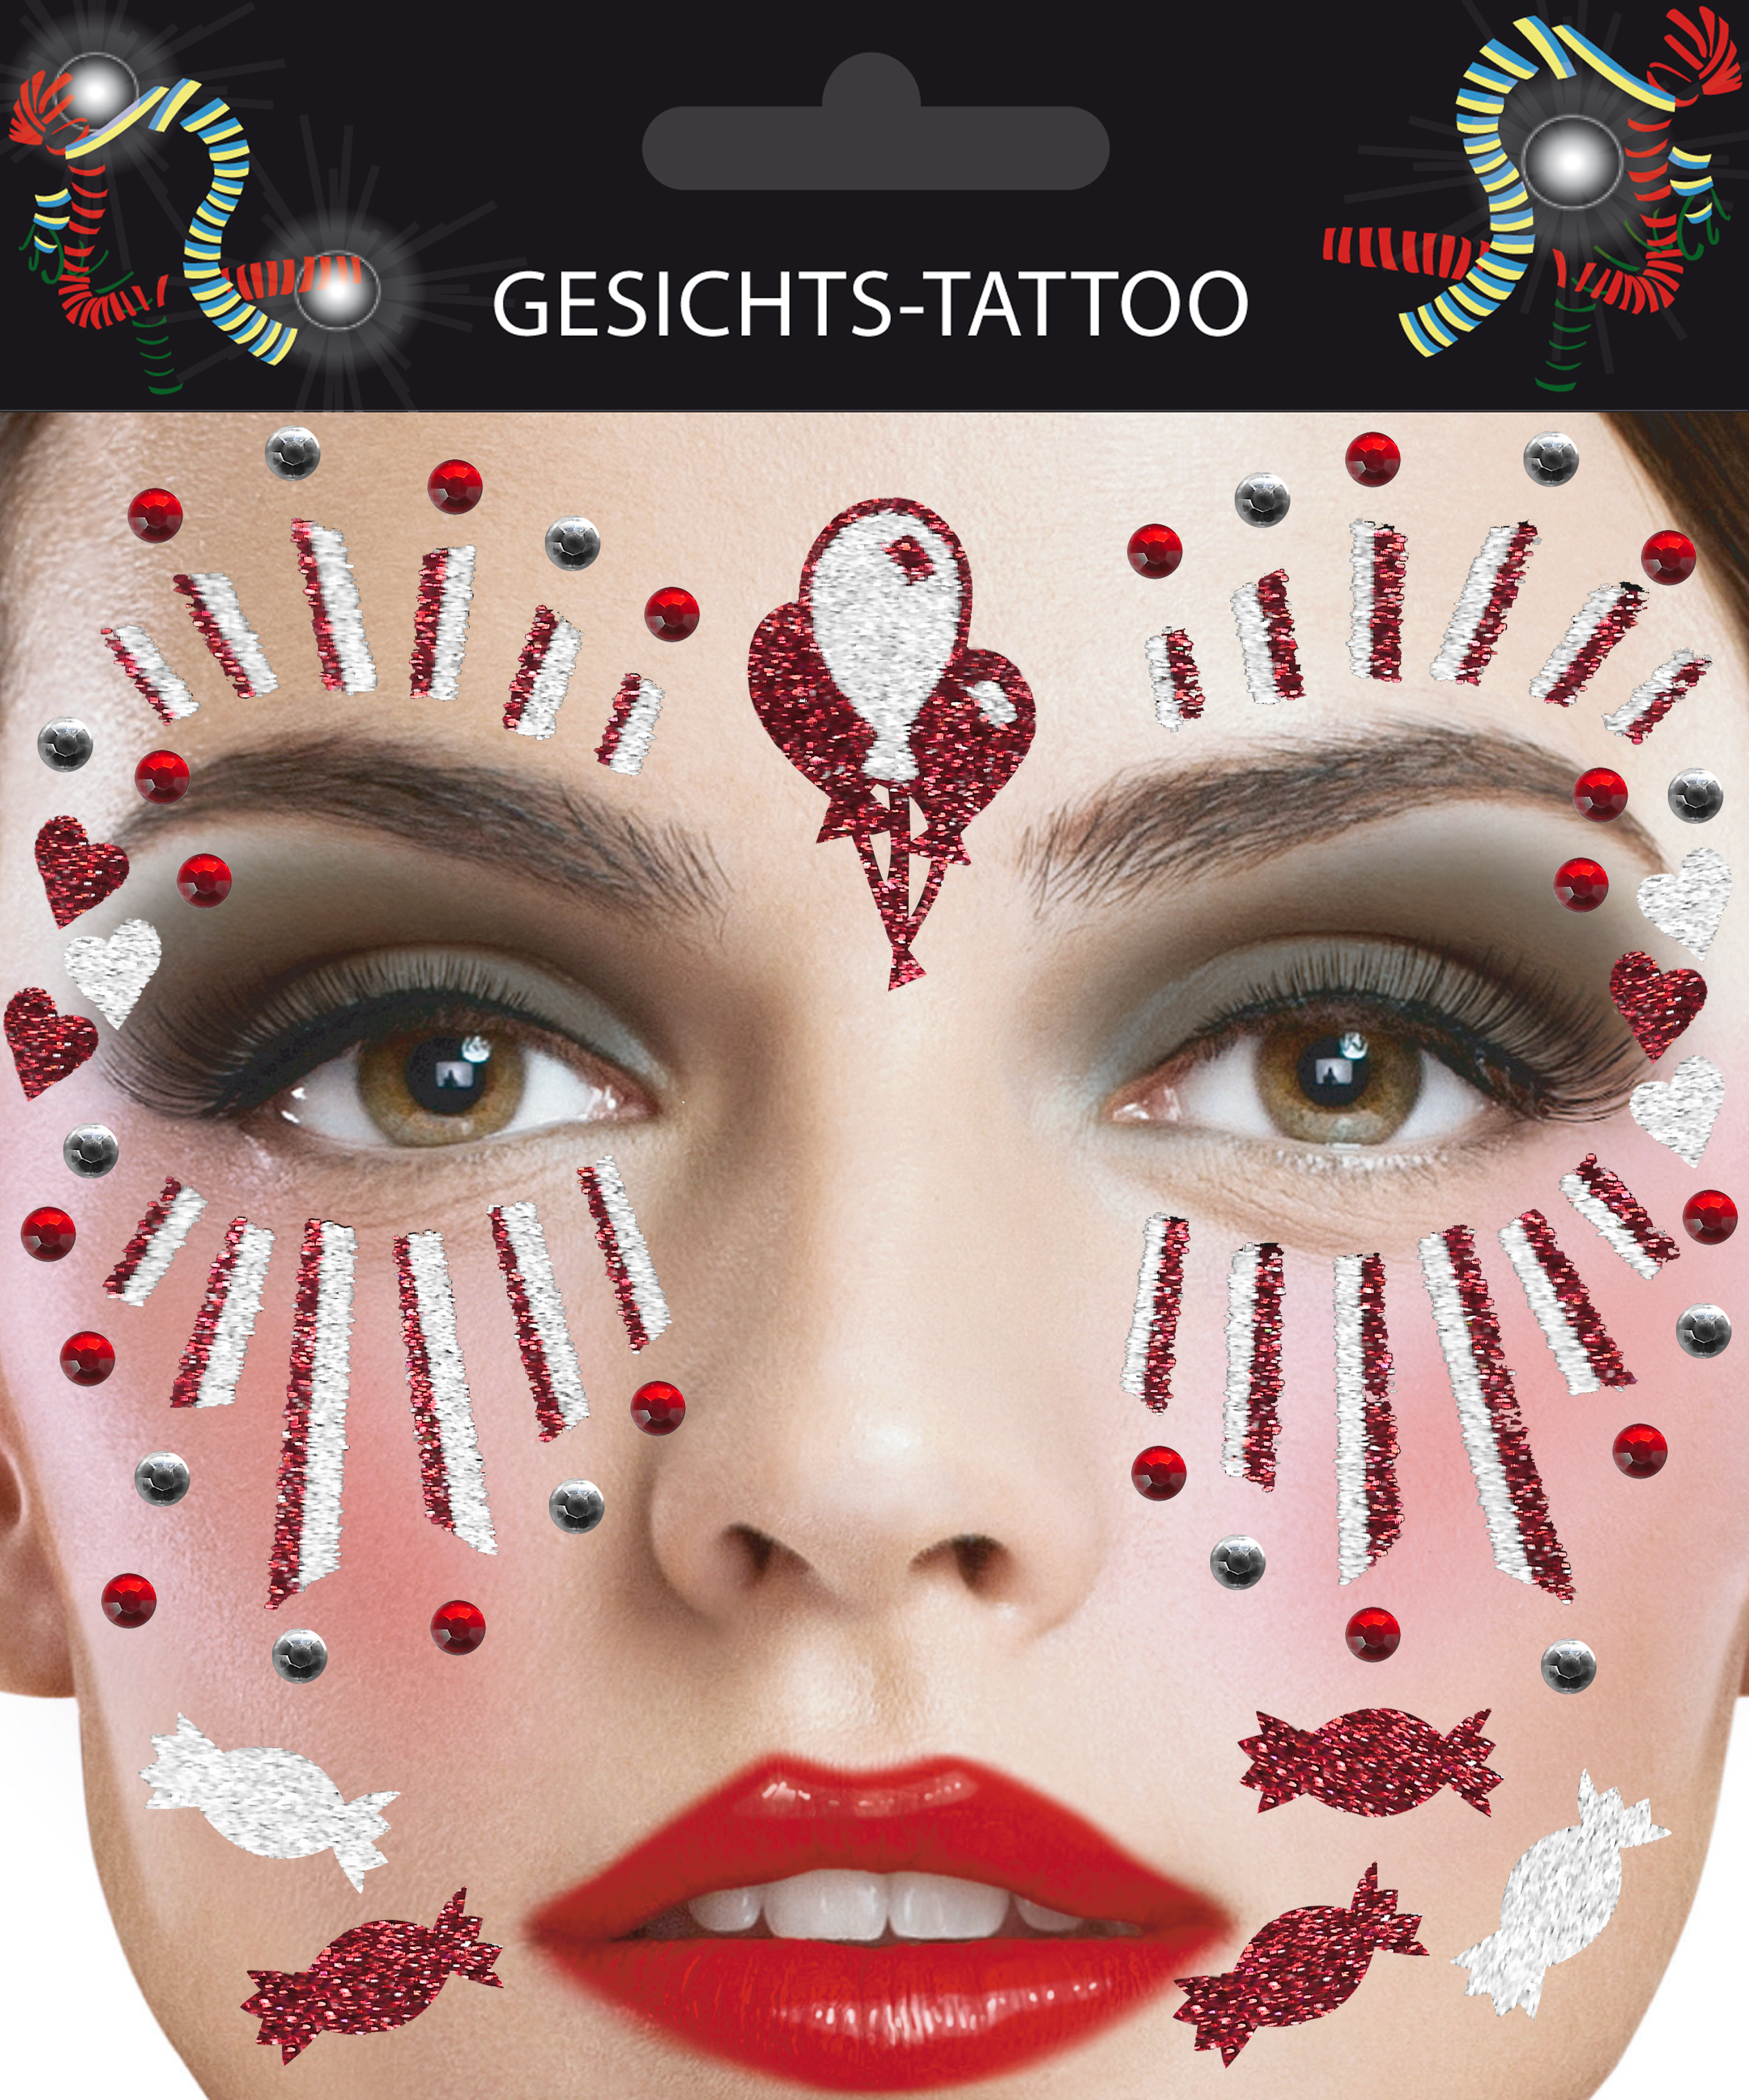 Gesichts-Tattoo Clown rot weiß